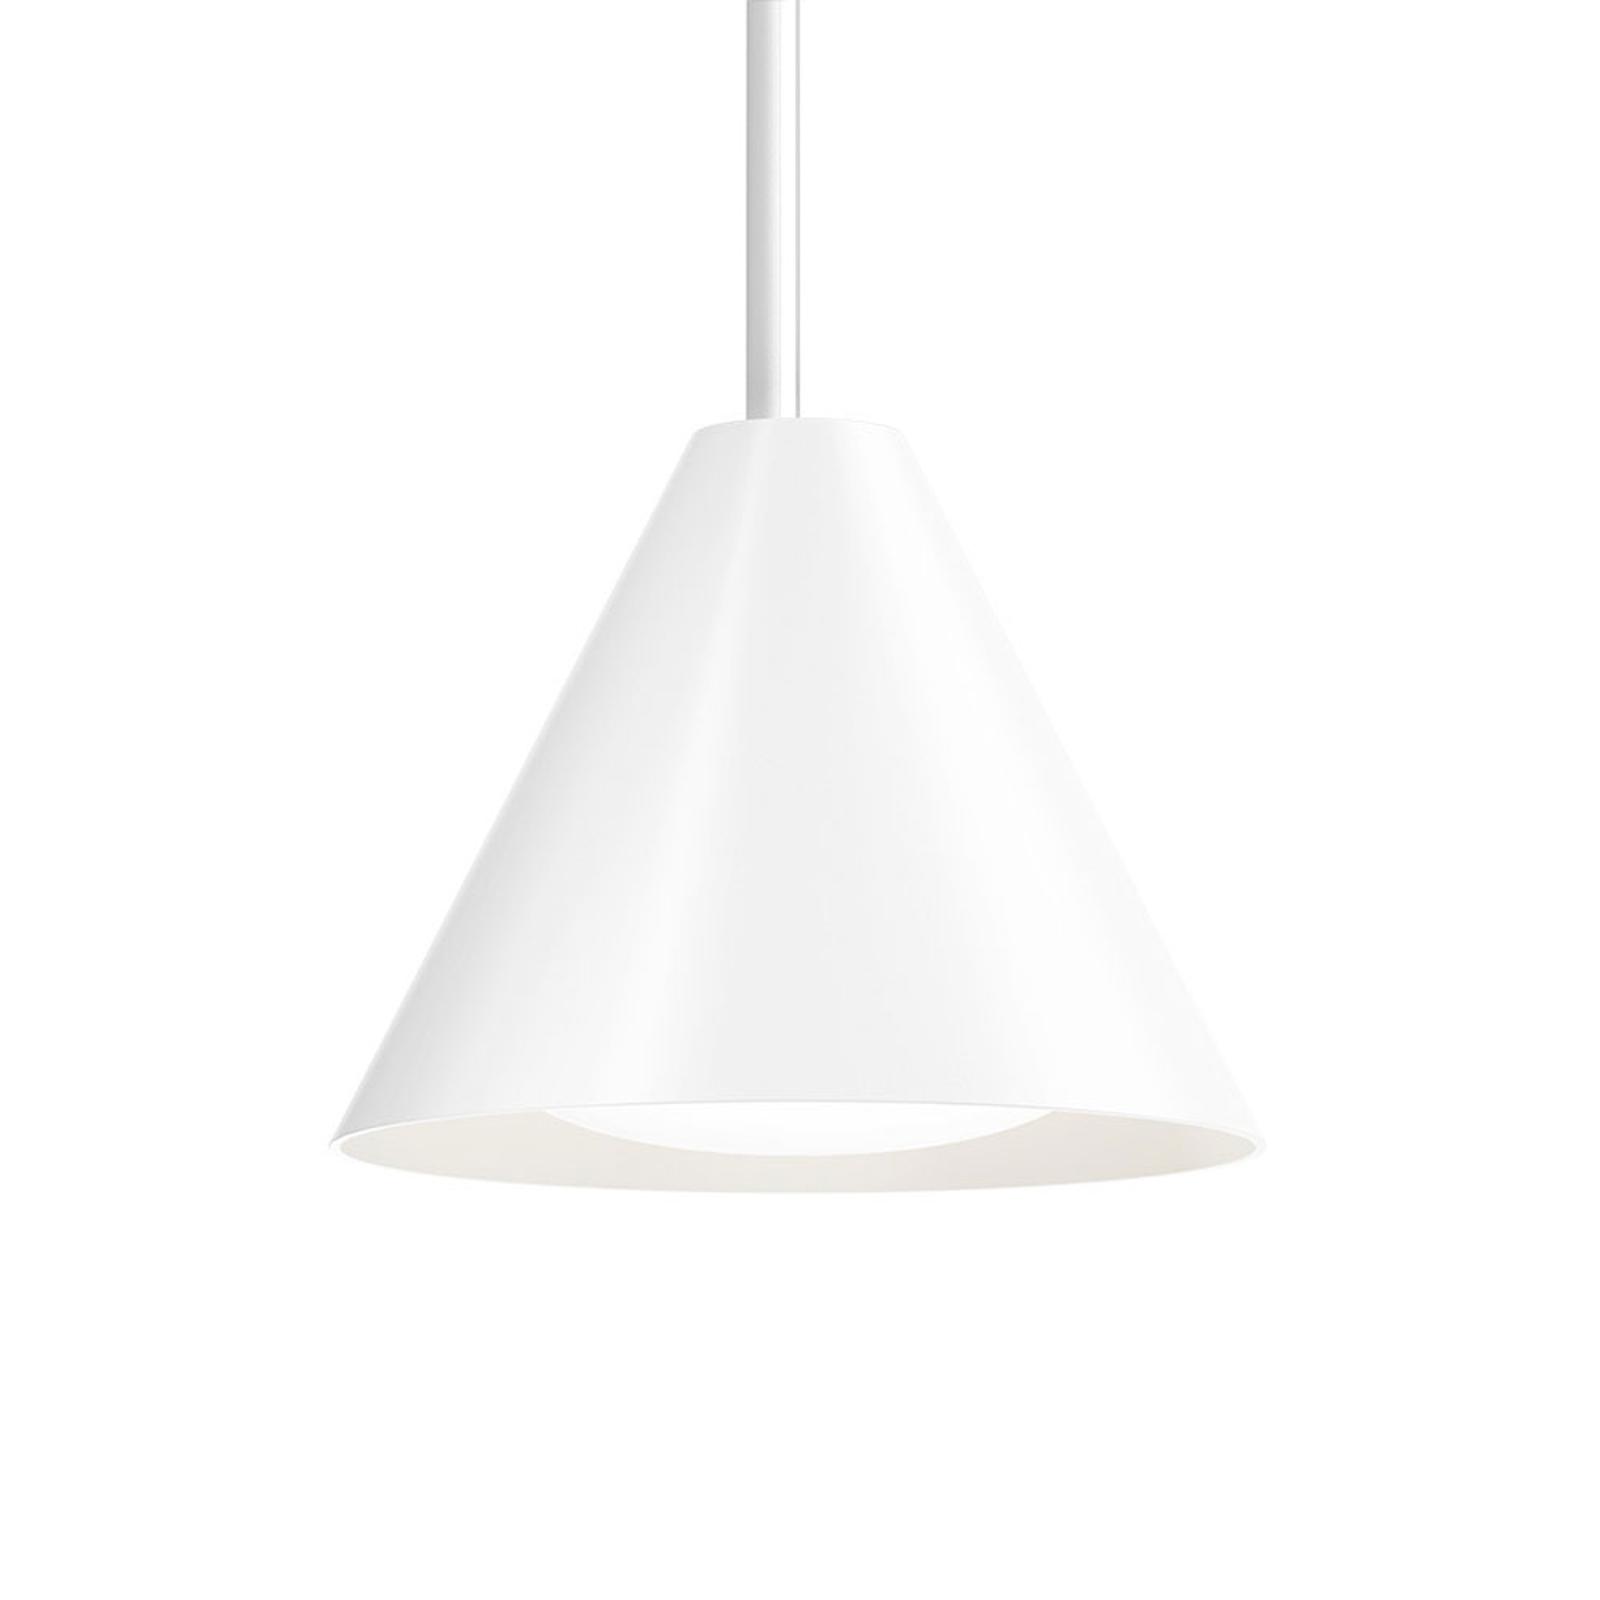 Louis Poulsen Keglen LED hanglamp 17,5cm wit